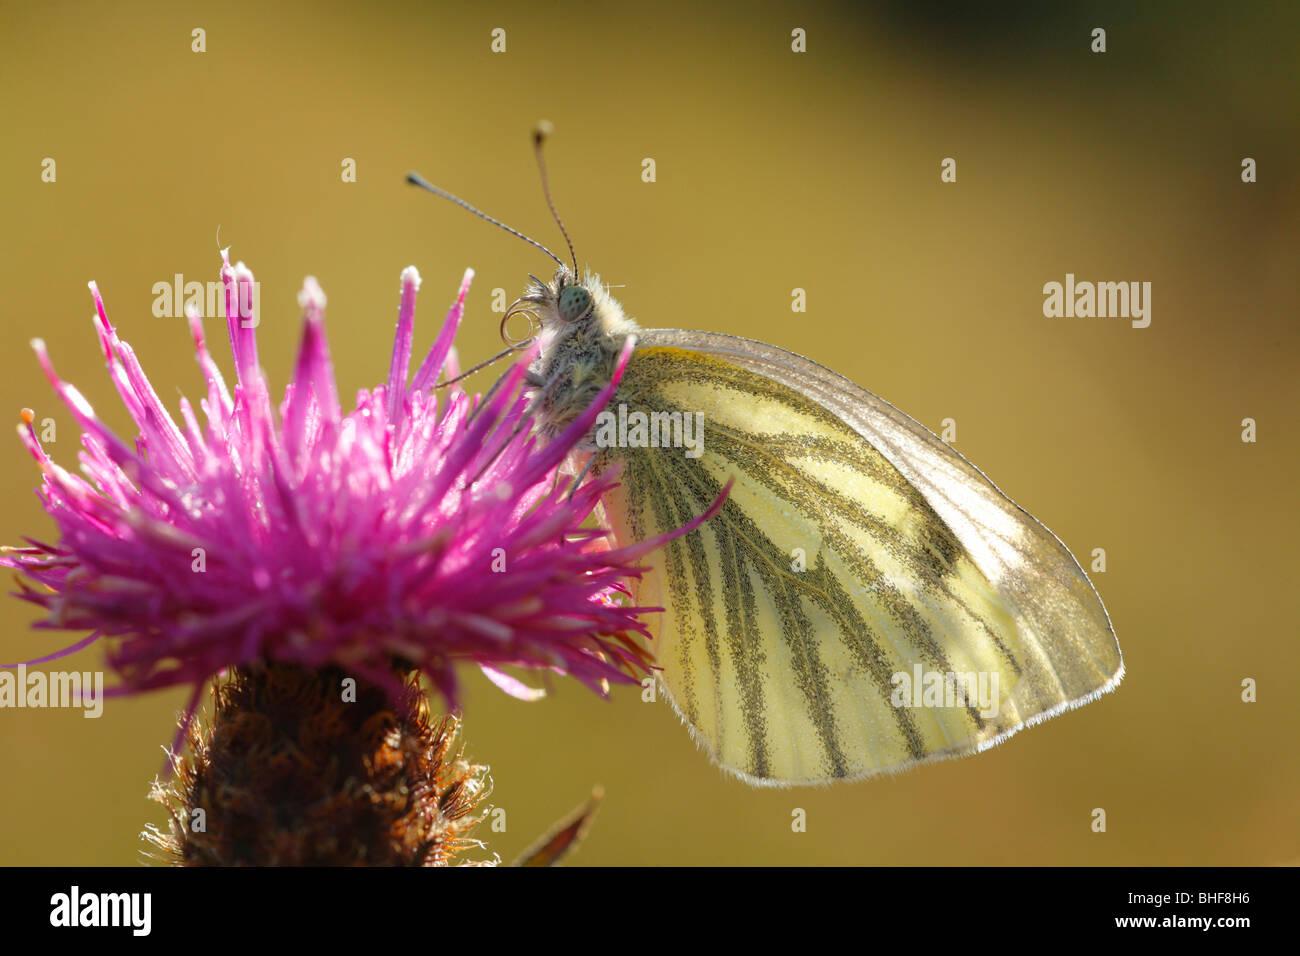 Green-veined White butterfly (Pieris napi) feeding on a Knapweed flower. Powys, Wales, UK. - Stock Image